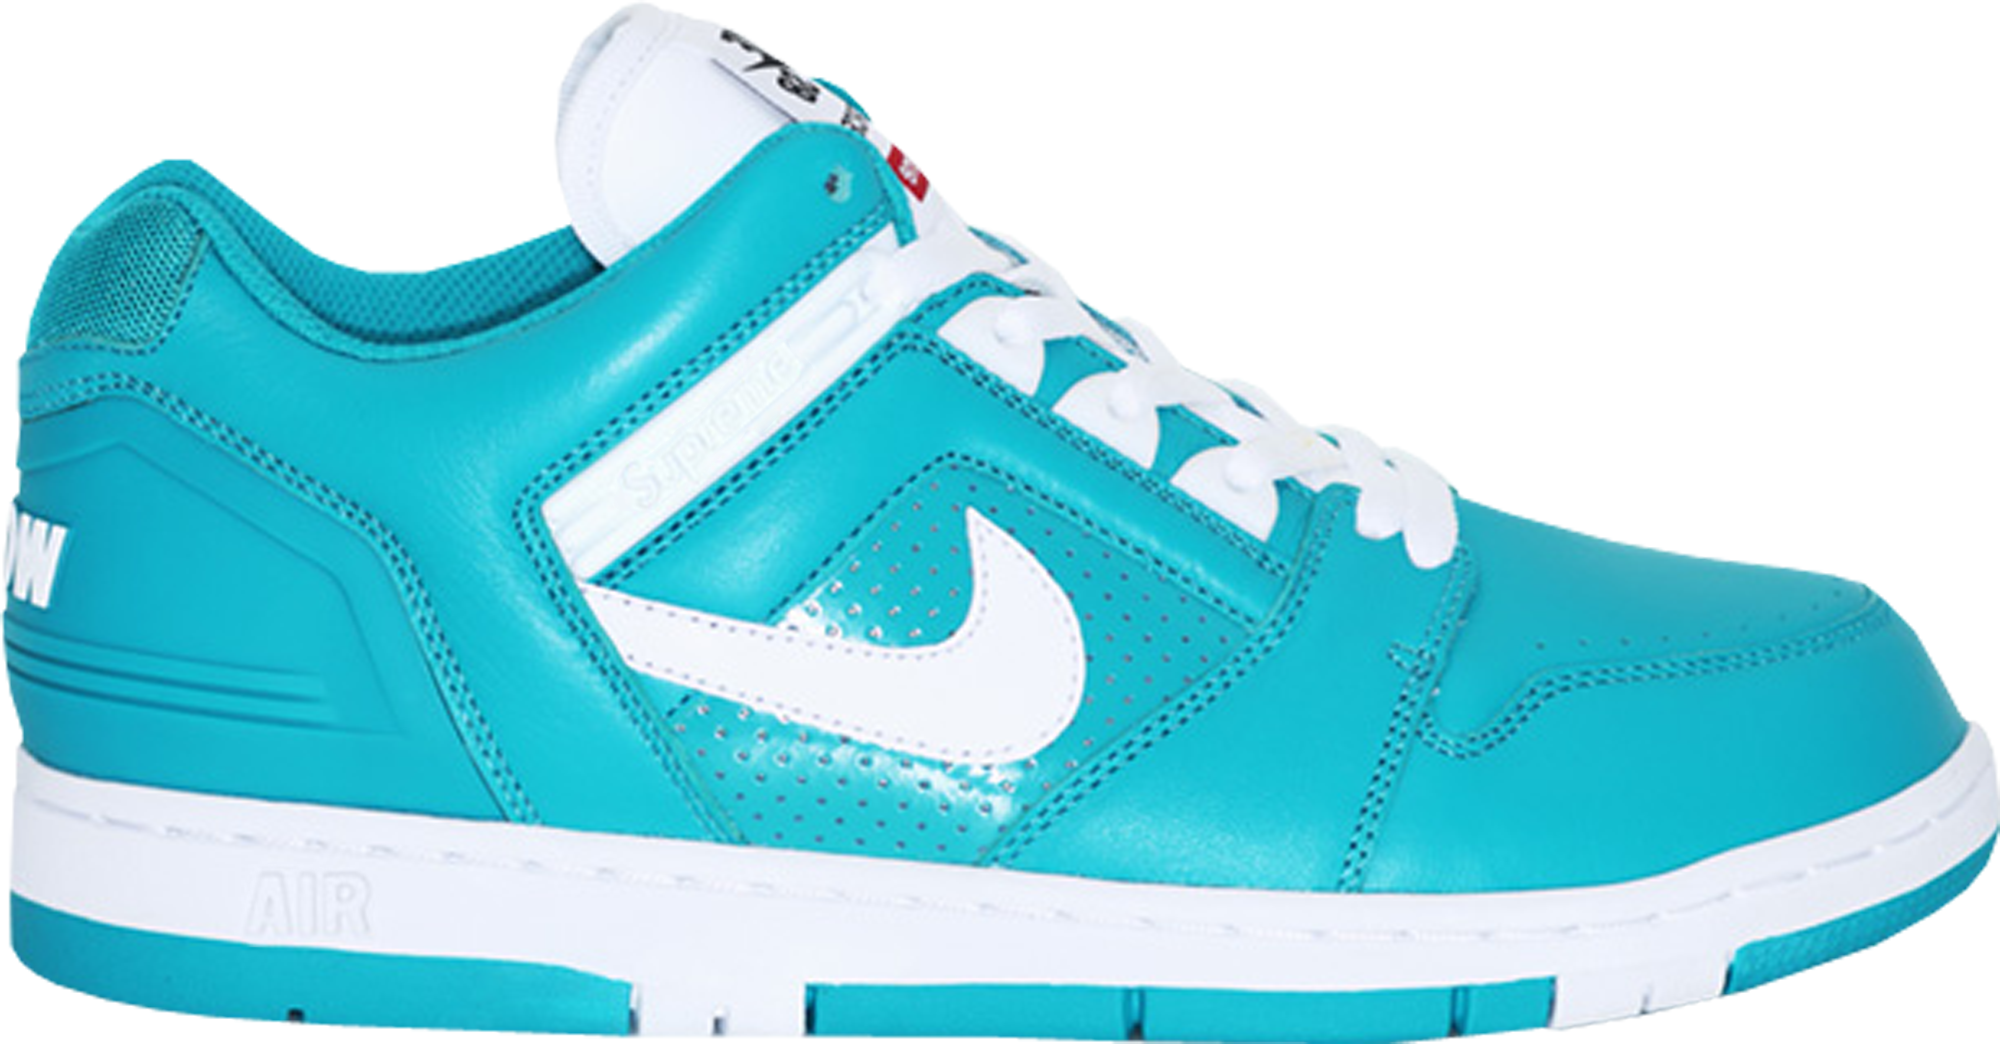 Nike SB Air Force 2 Low Supreme Blue Nike